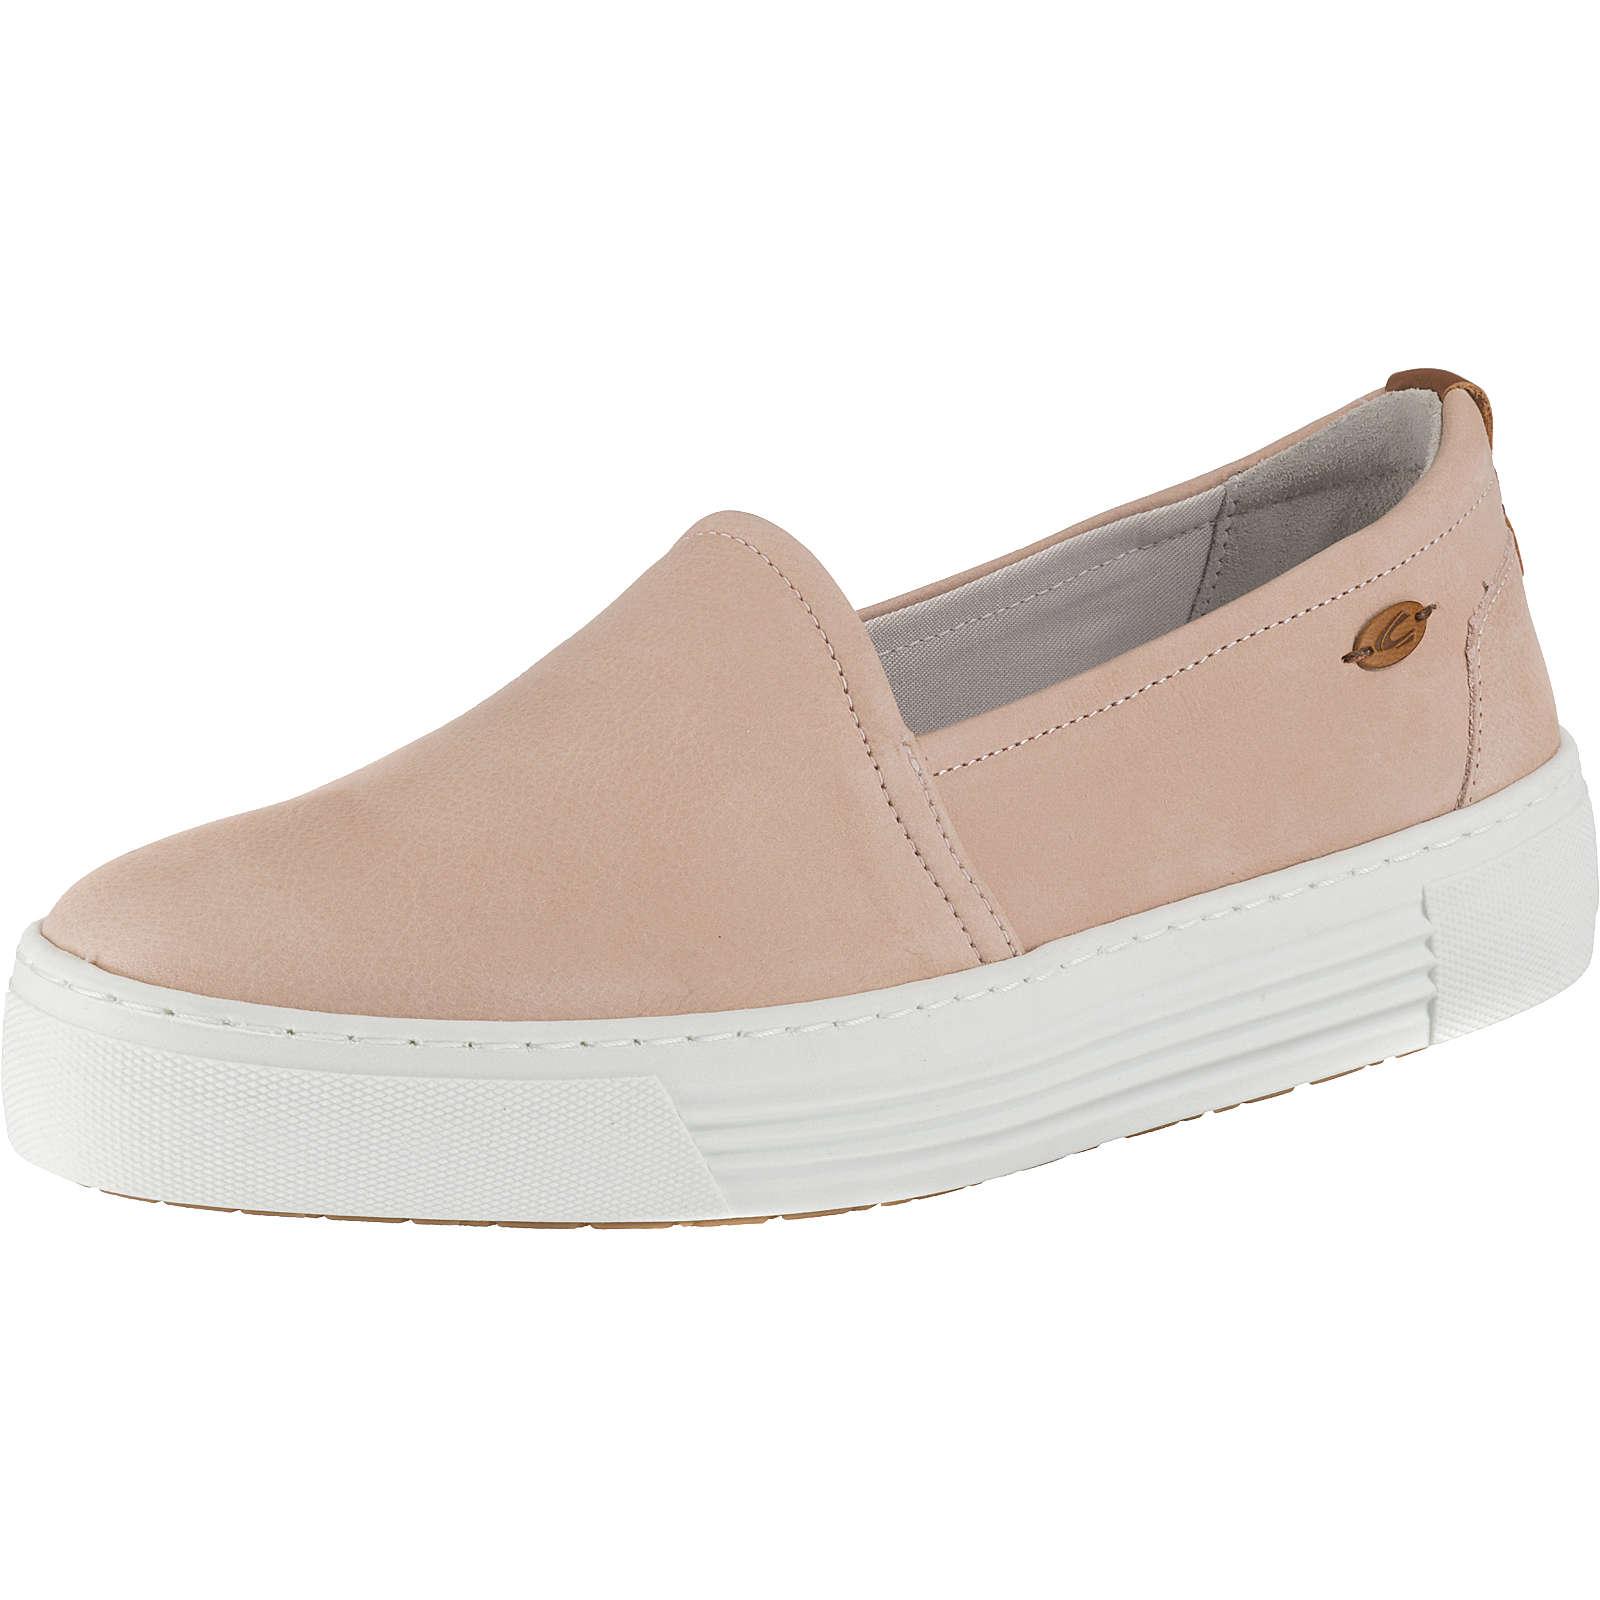 camel active Innocence 71 Sneakers Low rosa/weiß Damen Gr. 37,5